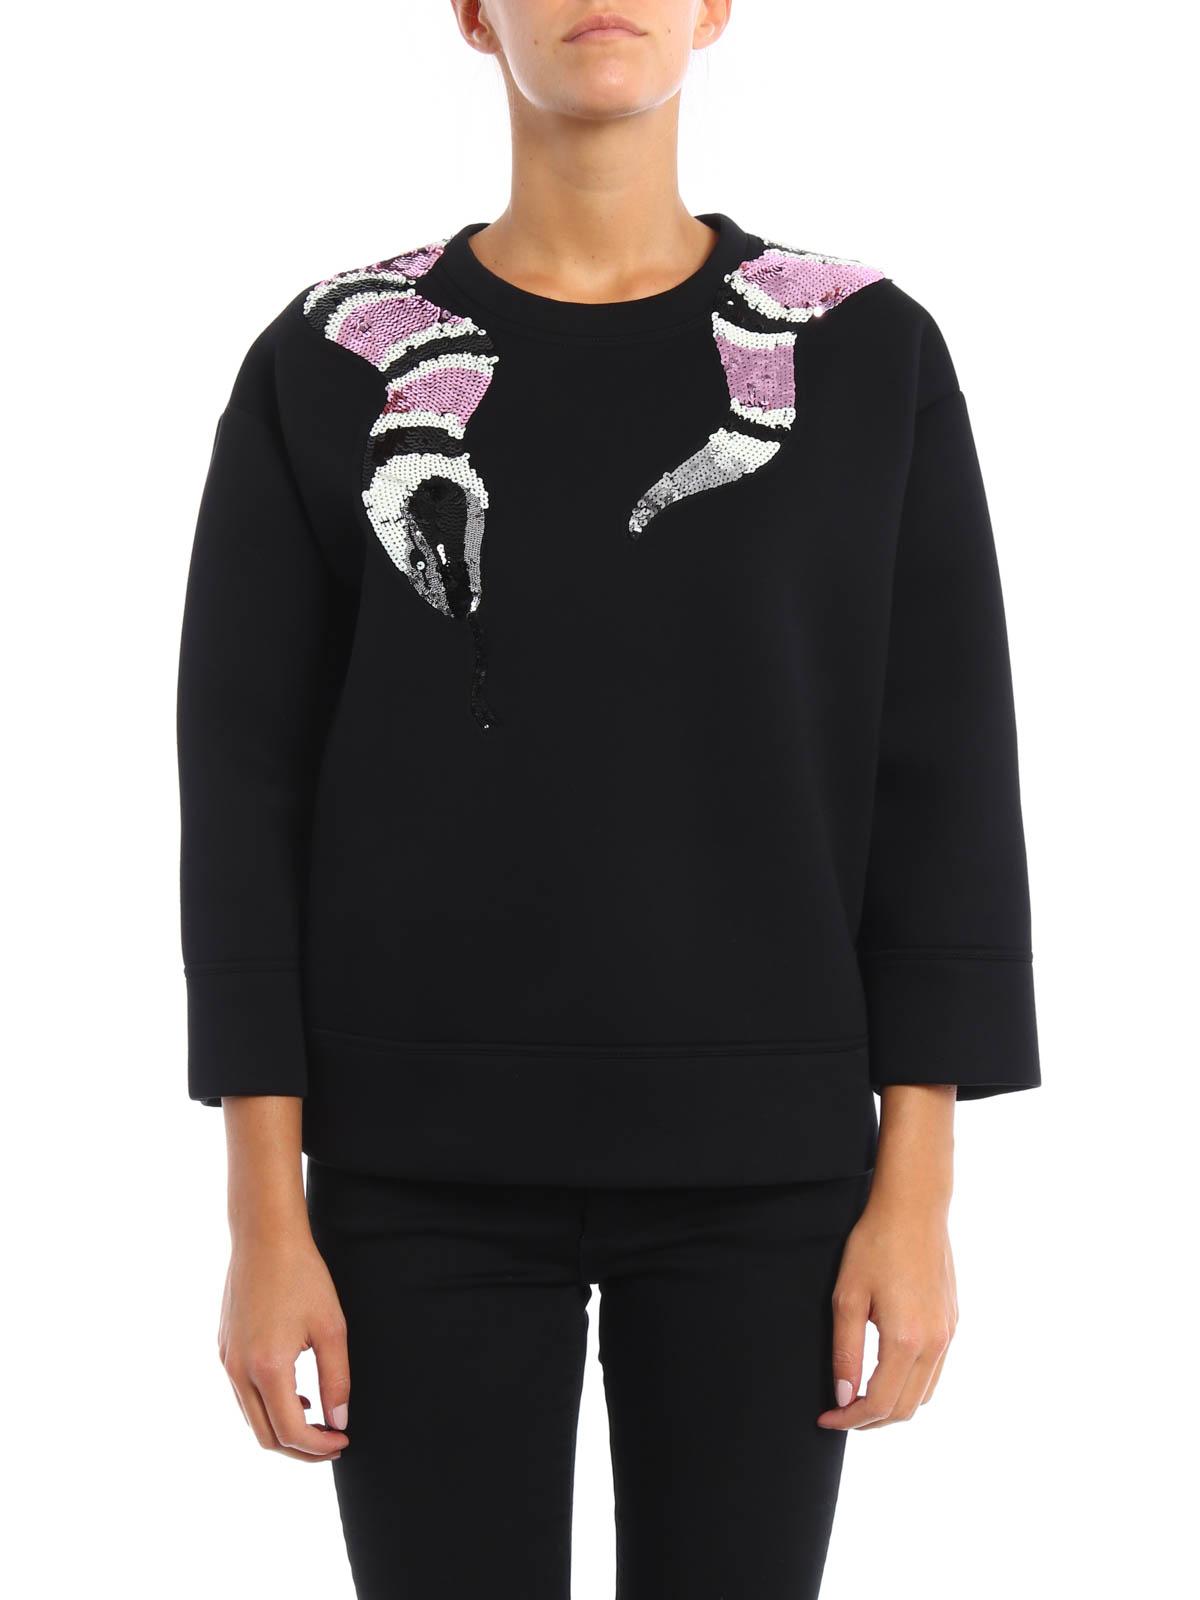 8ea15f09c88 GUCCI  Sweatshirts   Sweaters online - Snake embroidery sweatshirt